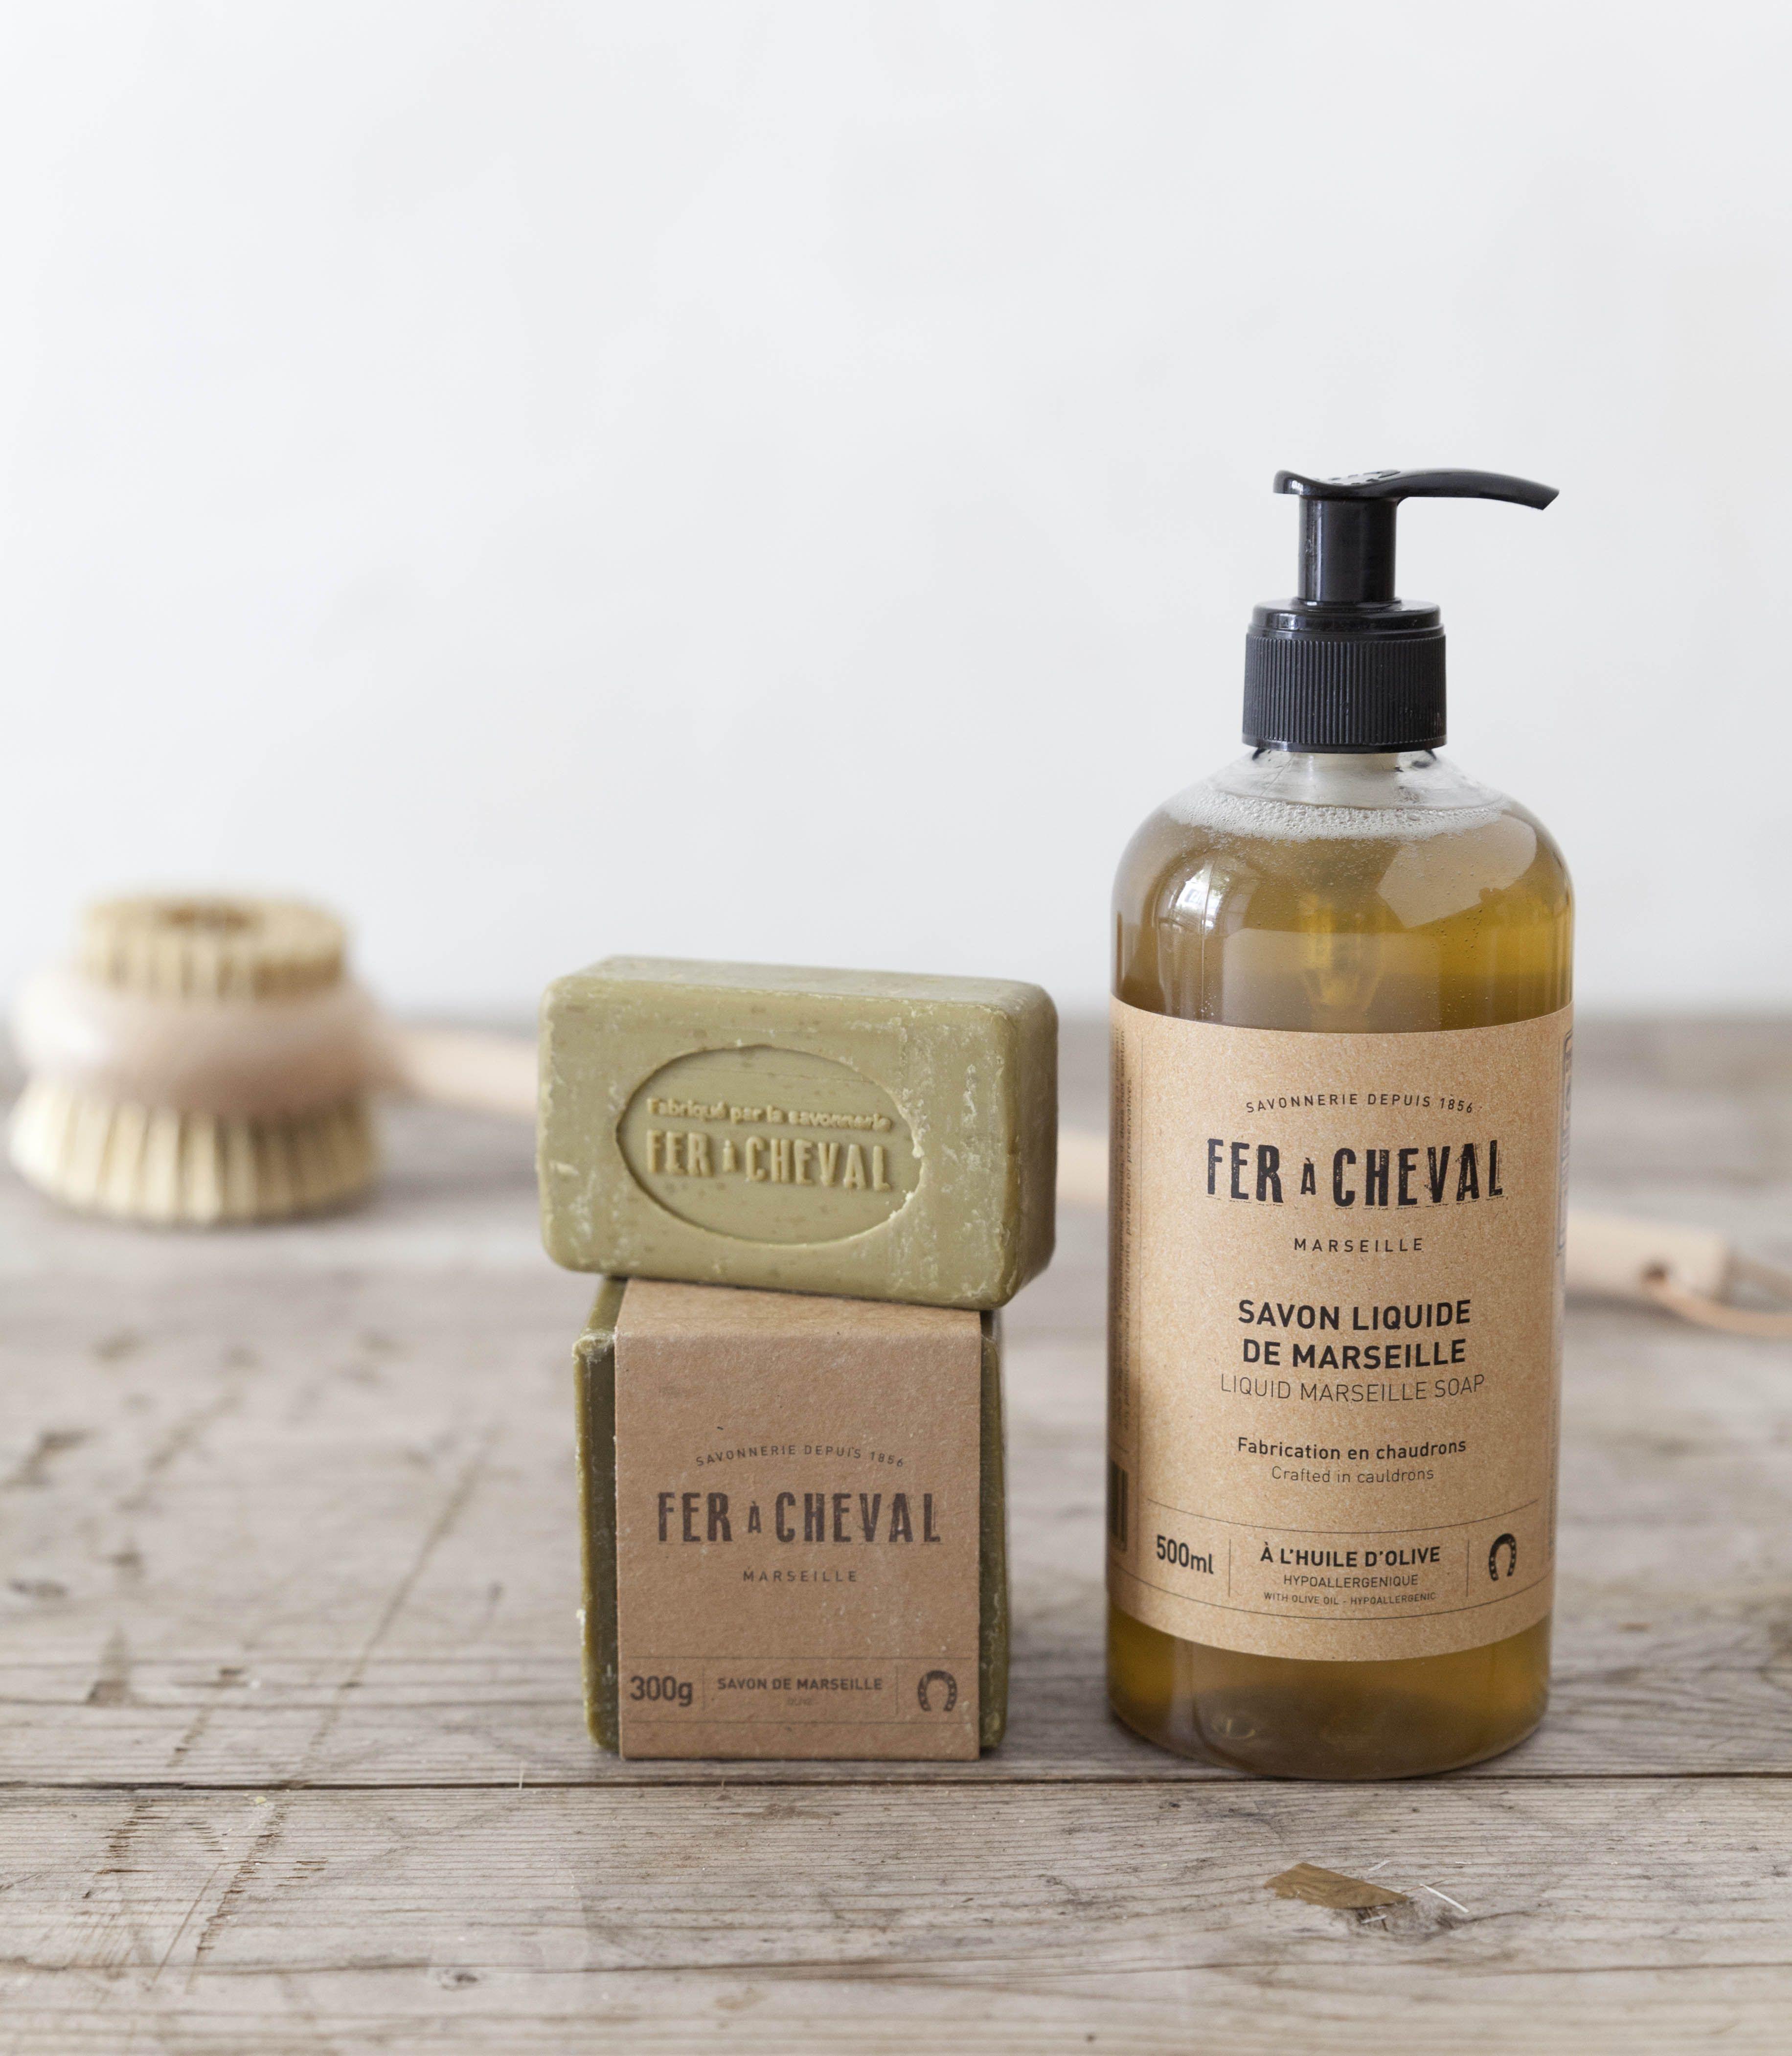 Rayher Tampon fond de moule savon 100/% naturel artisanal